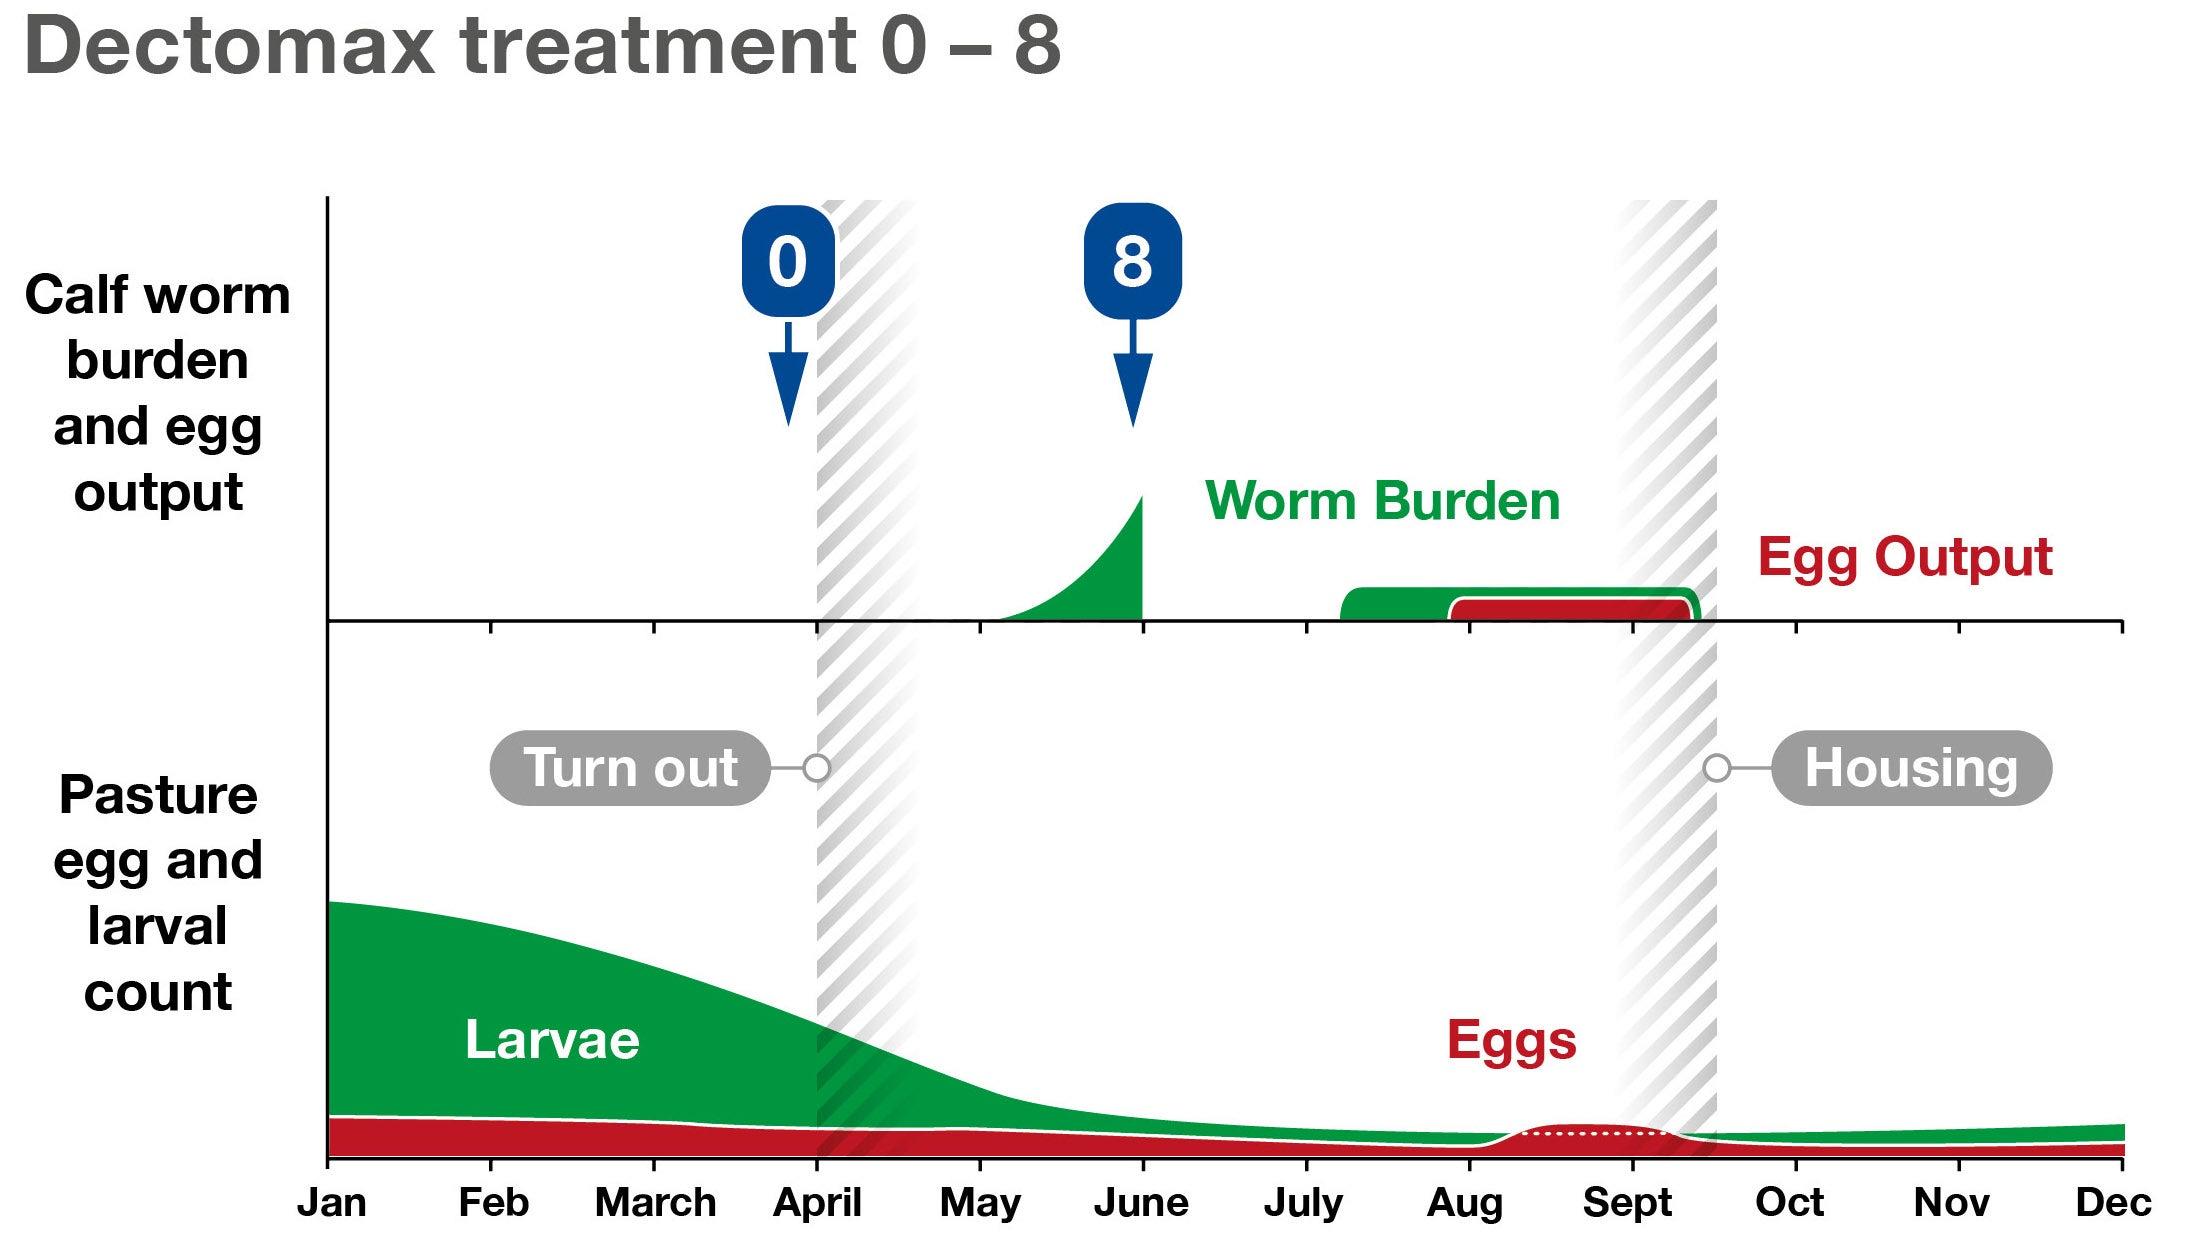 Gut Worm Burden after Dectomax Treatment